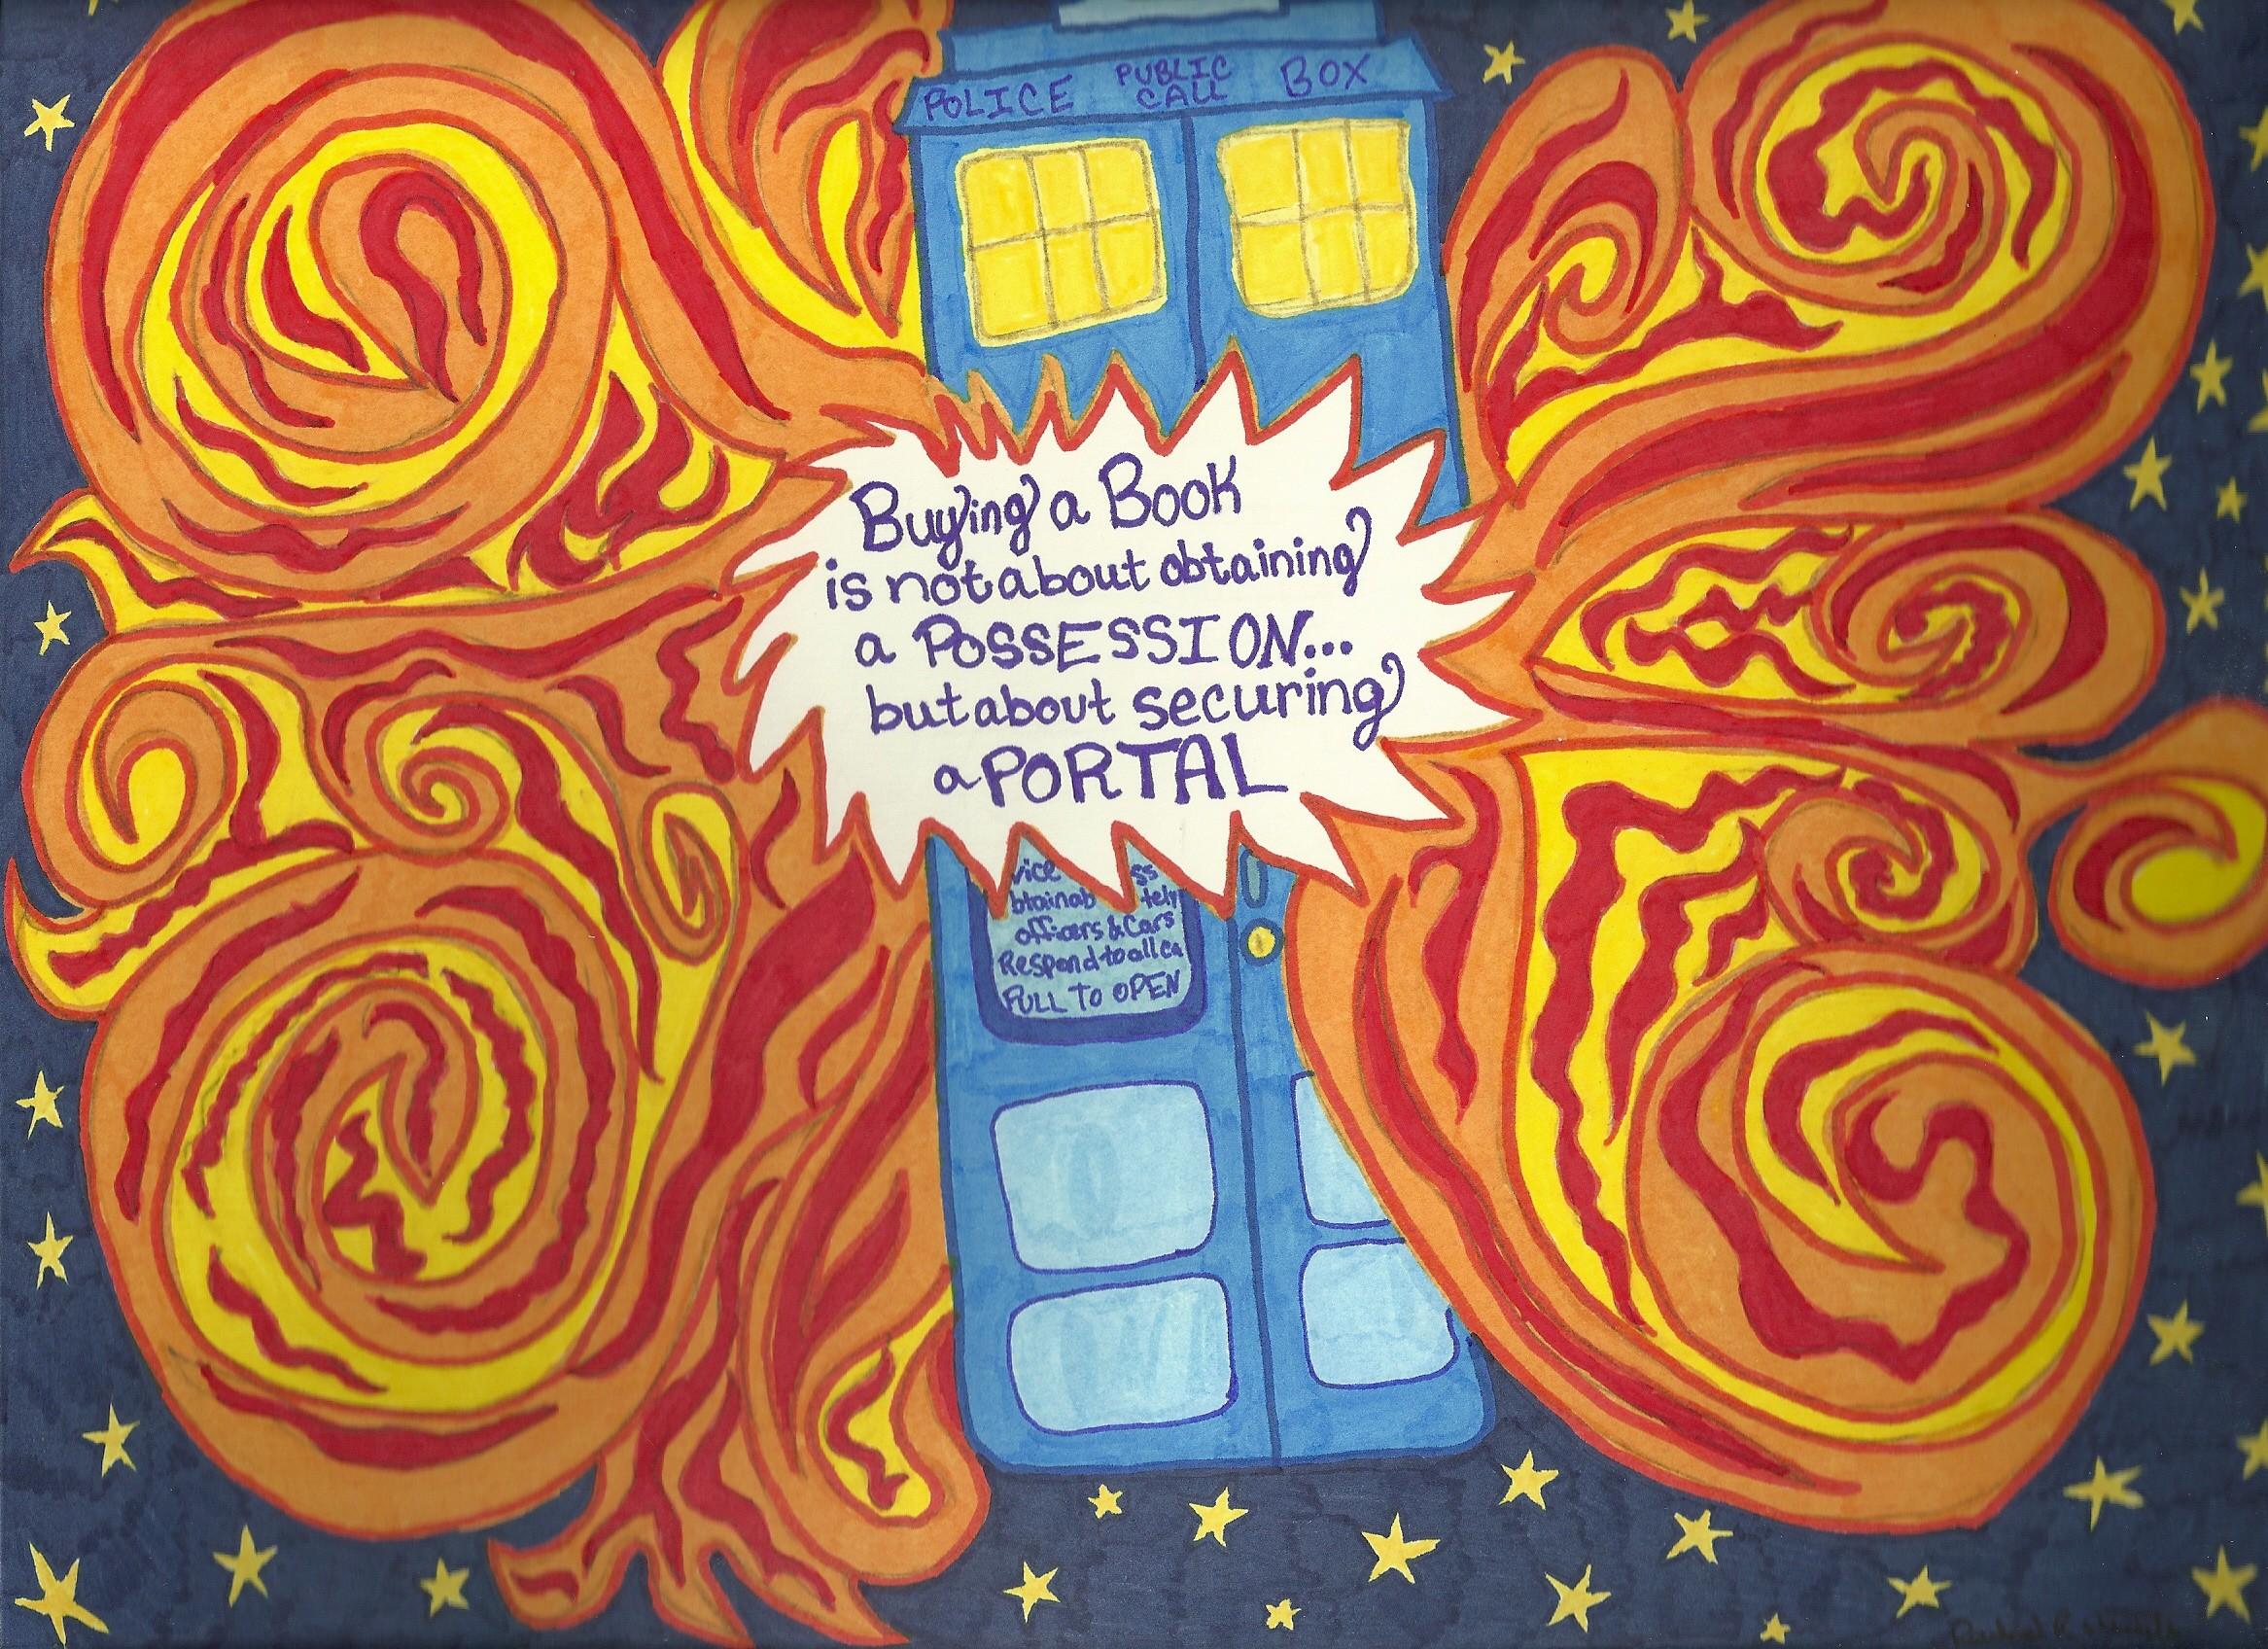 … extragoto10line Exploding TARDIS with Book Quote (1 of 2) by  extragoto10line